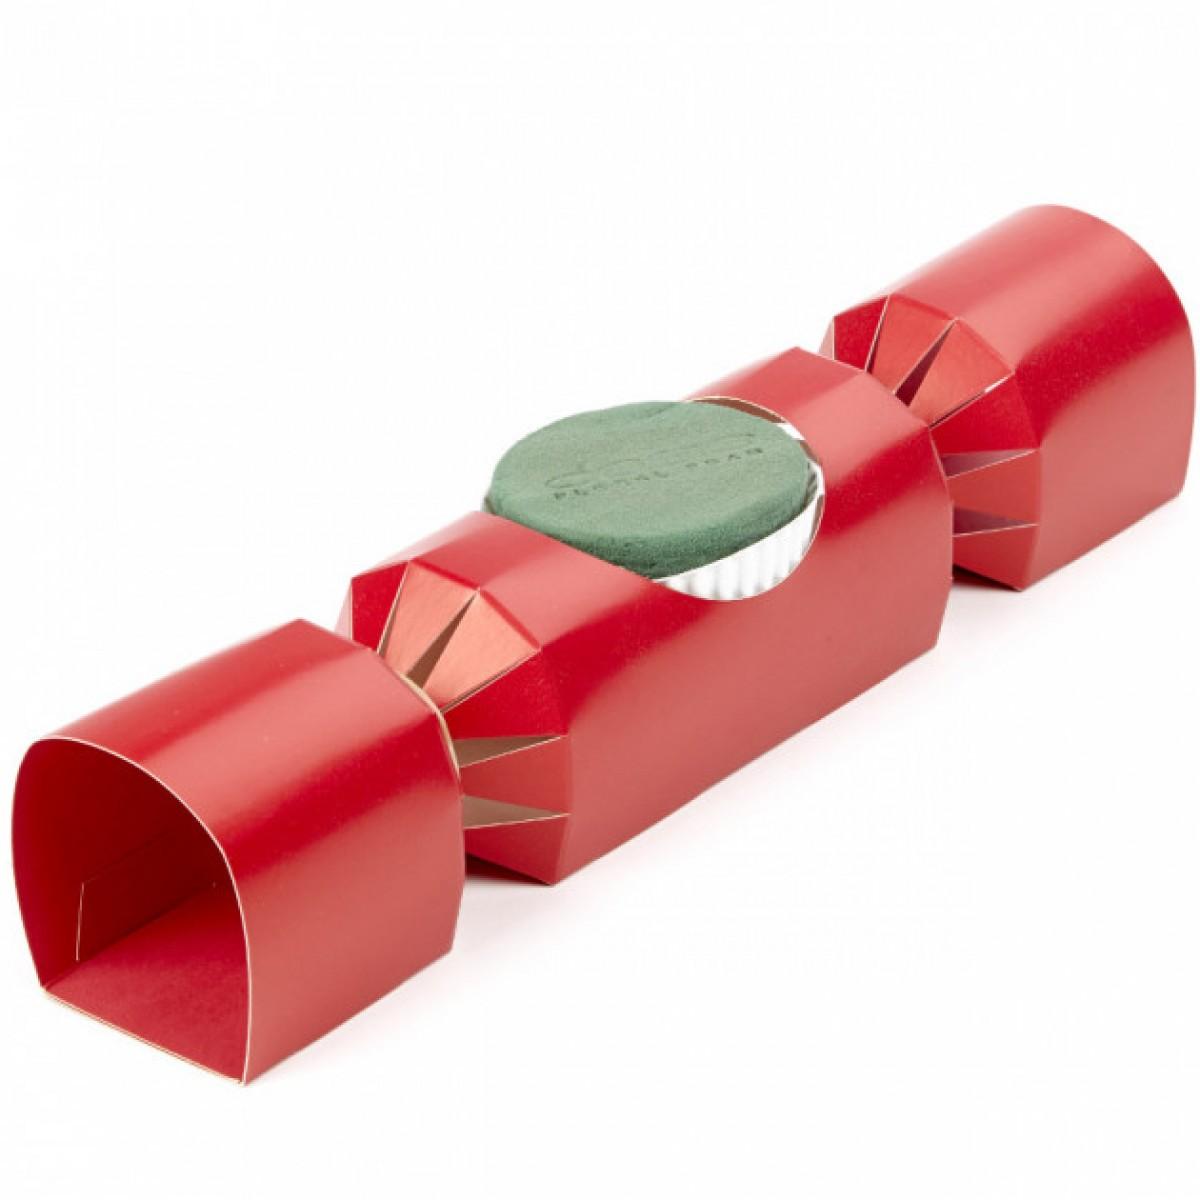 Red Floral Foam Cracker - 1 No